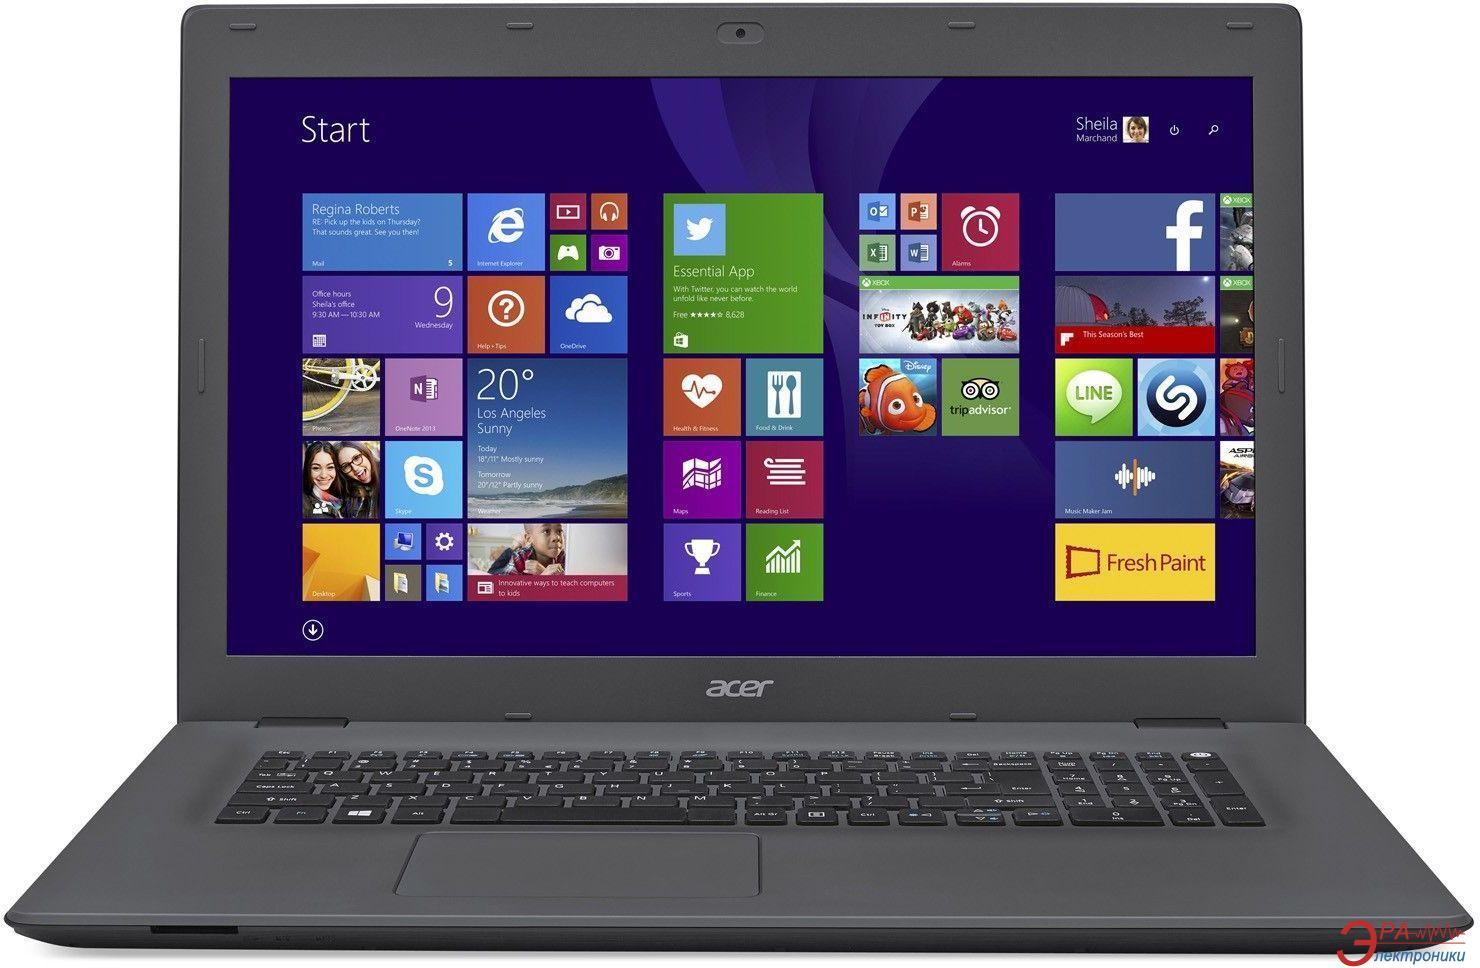 Ноутбук Acer E5-773G-38D3 (NX.G2BEU.005) Black 17,3